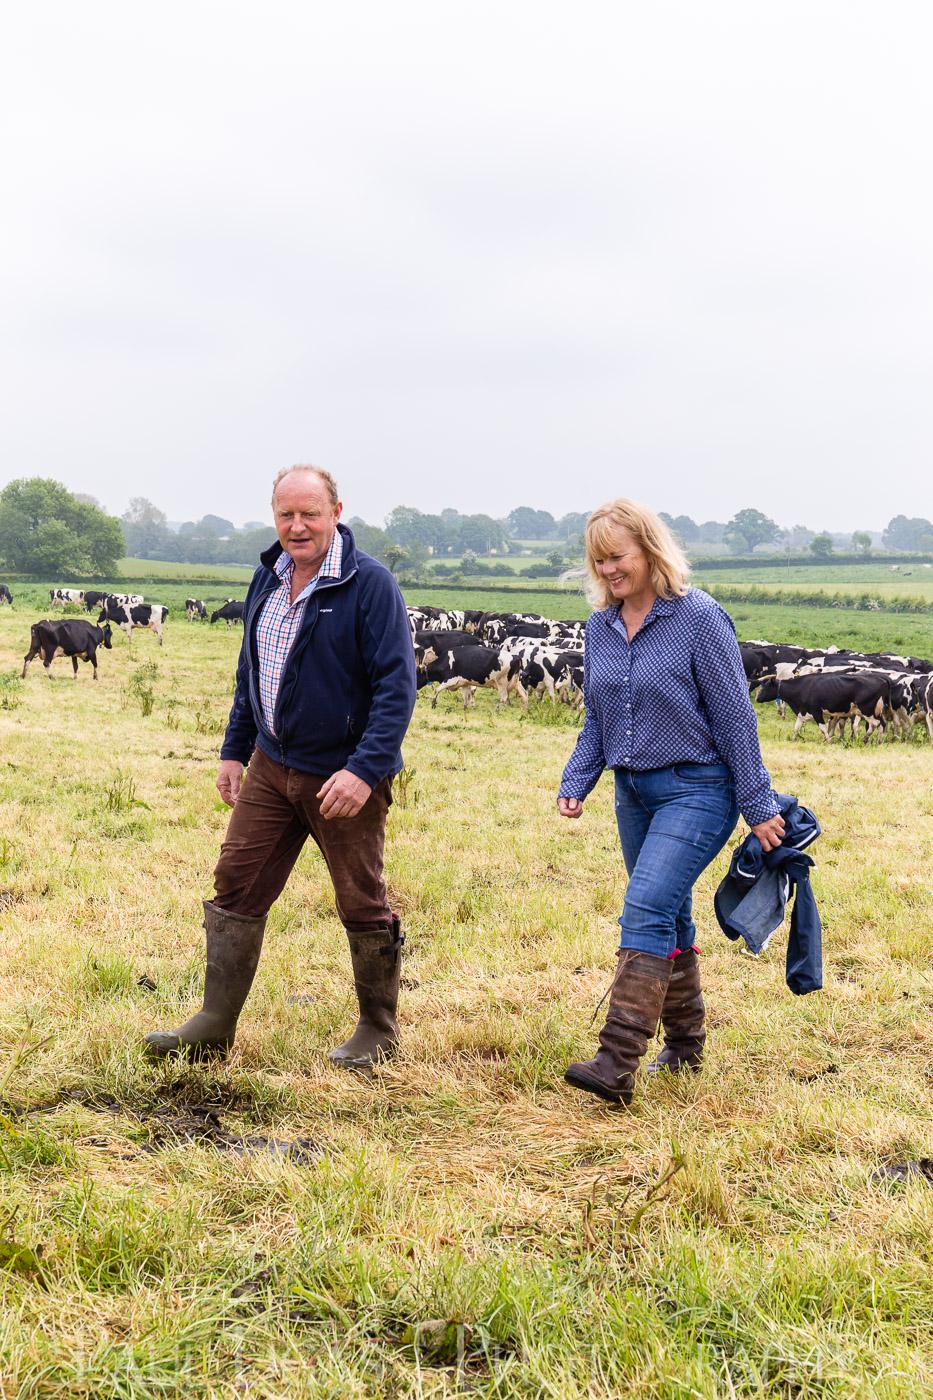 Milk Matters magazine herefordshire farming agriculture portrait photographer 6917